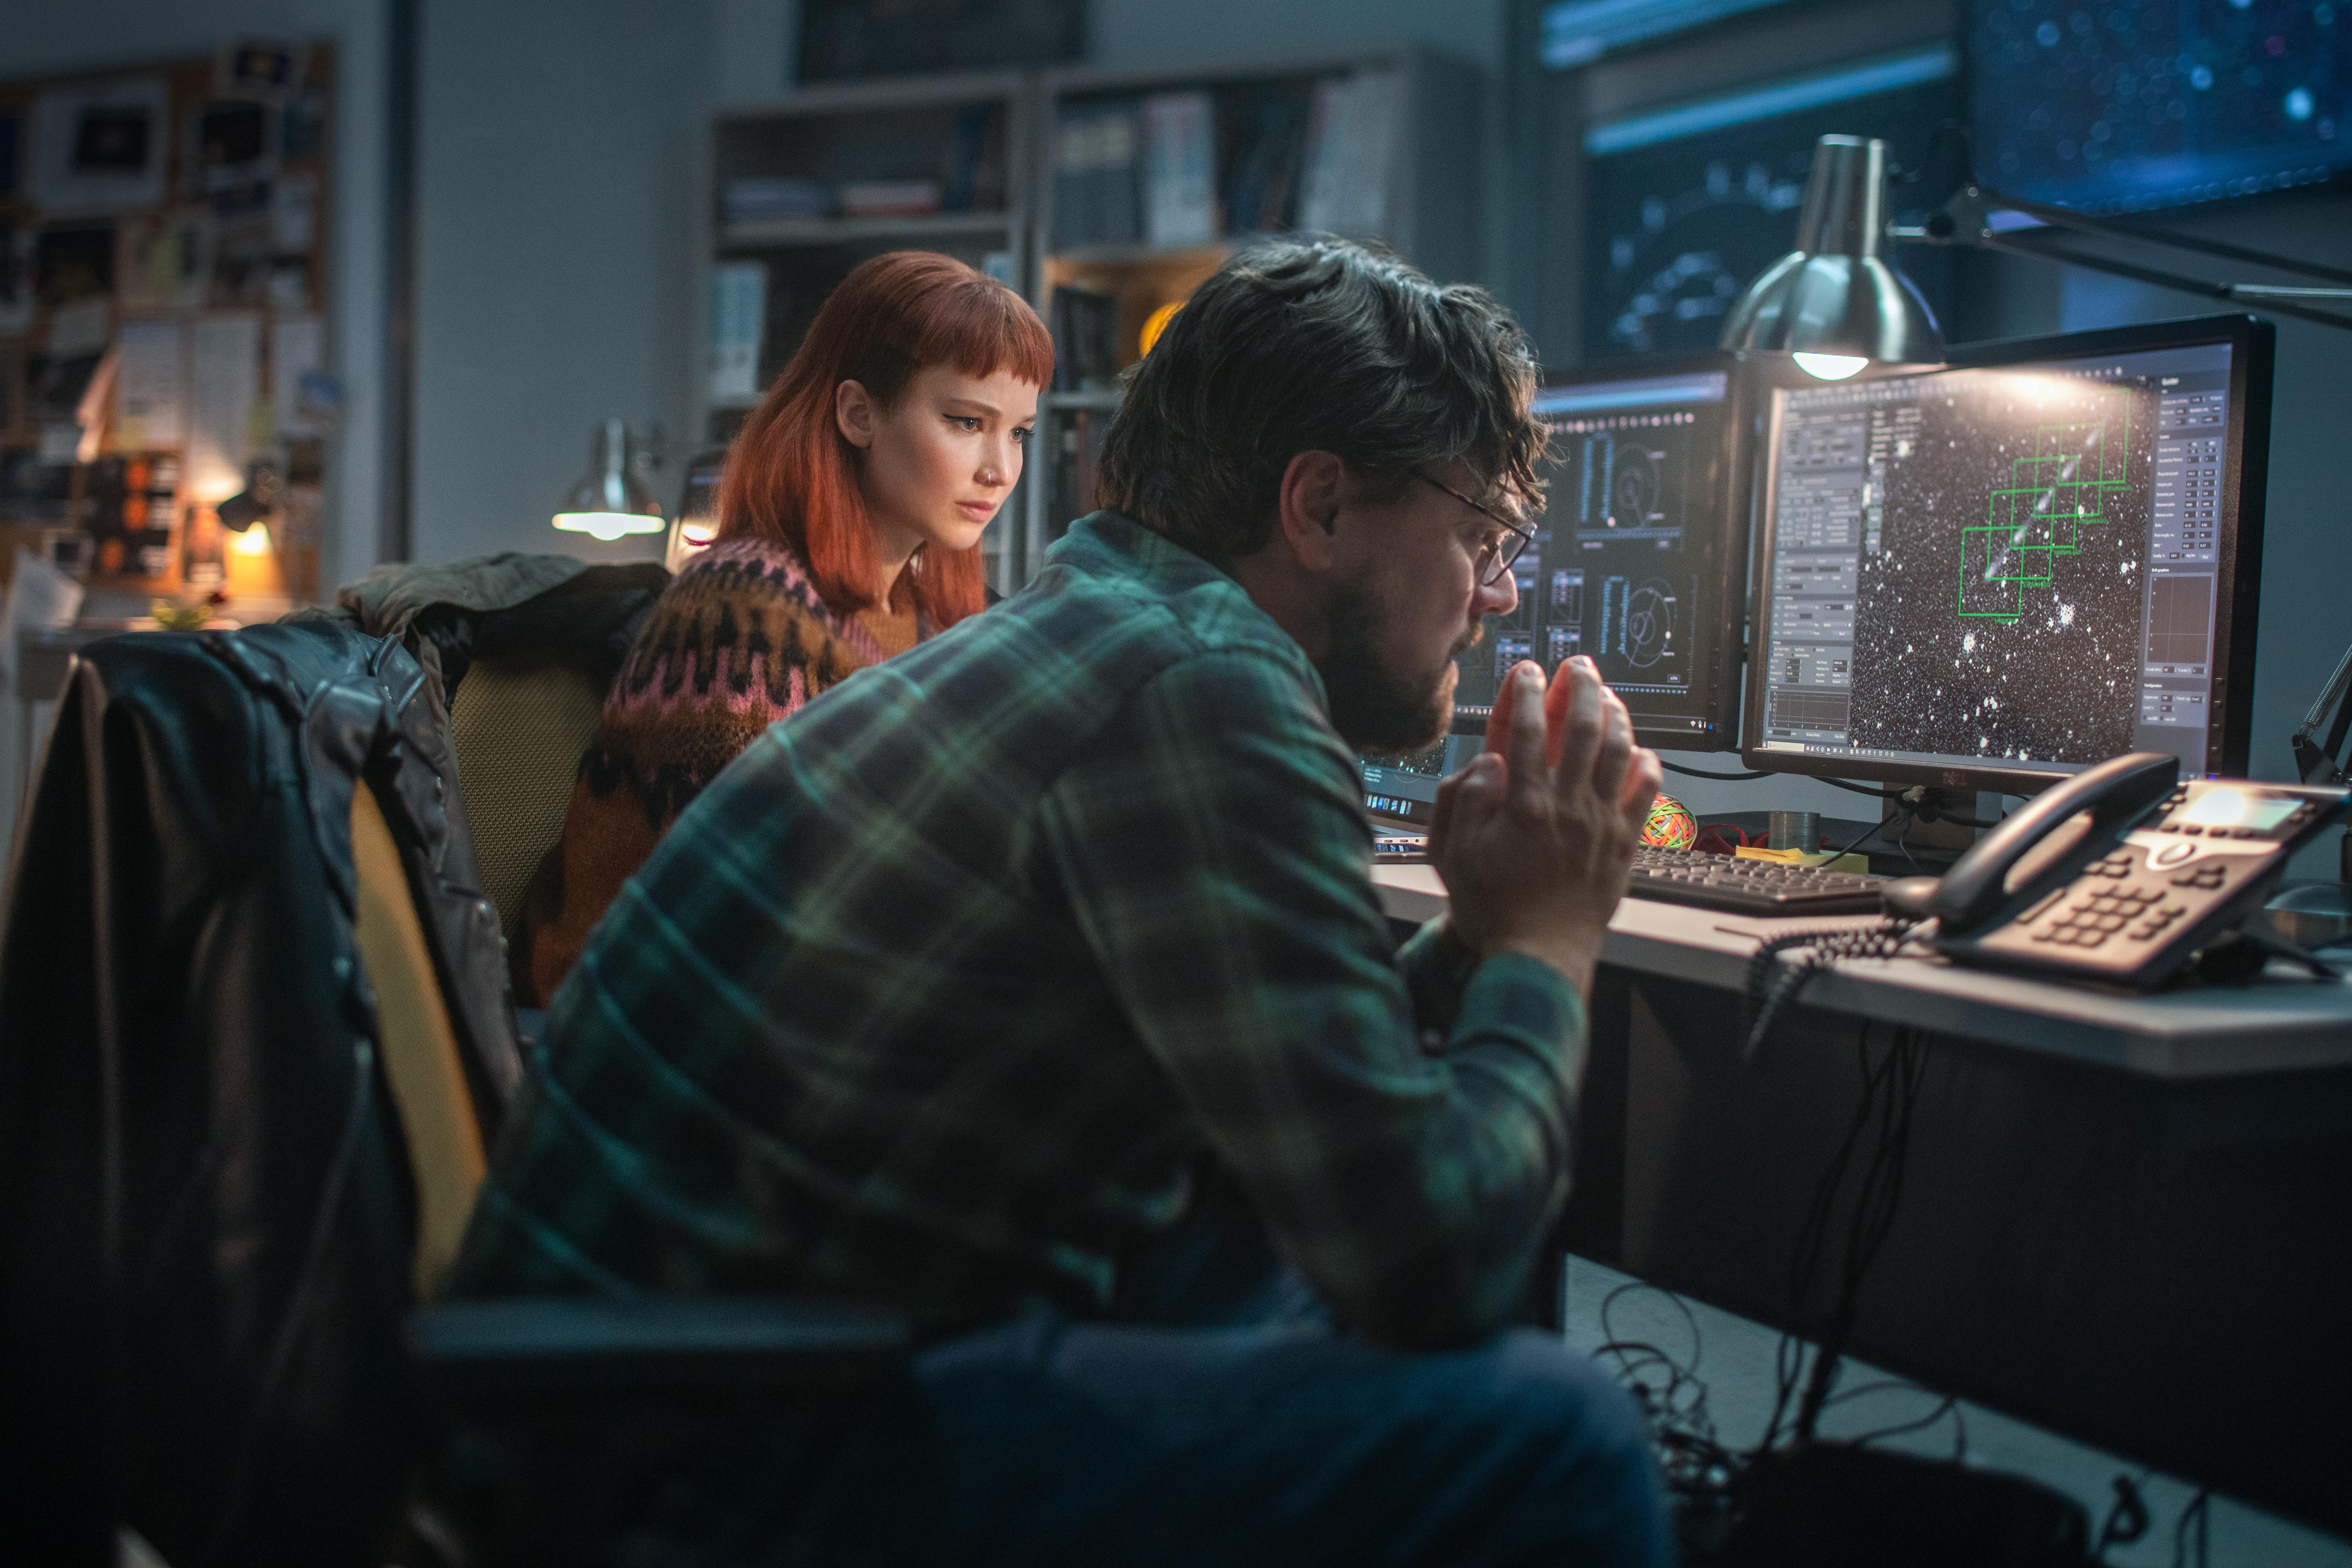 DON'T LOOK UP (L to R) JENNIFER LAWRENCE as KATE DIBIASKY, LEONARDO DICAPRIO as DR. RANDALL MINDY. Cr. NIKO TAVERNISE/NETFLIX © 2021